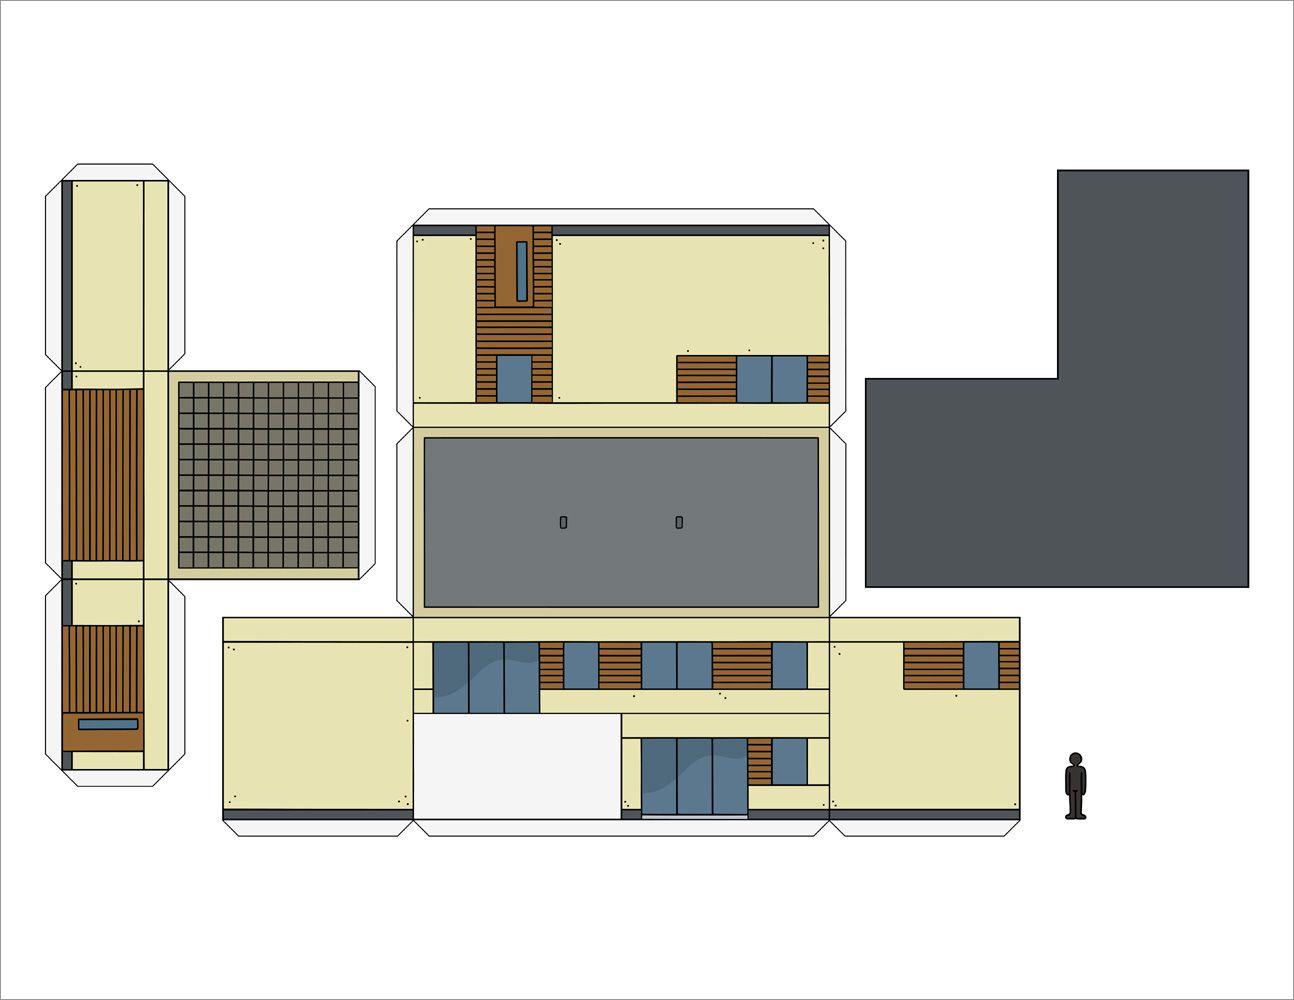 Papercraft Houses Papercraft Model Of A Modern House